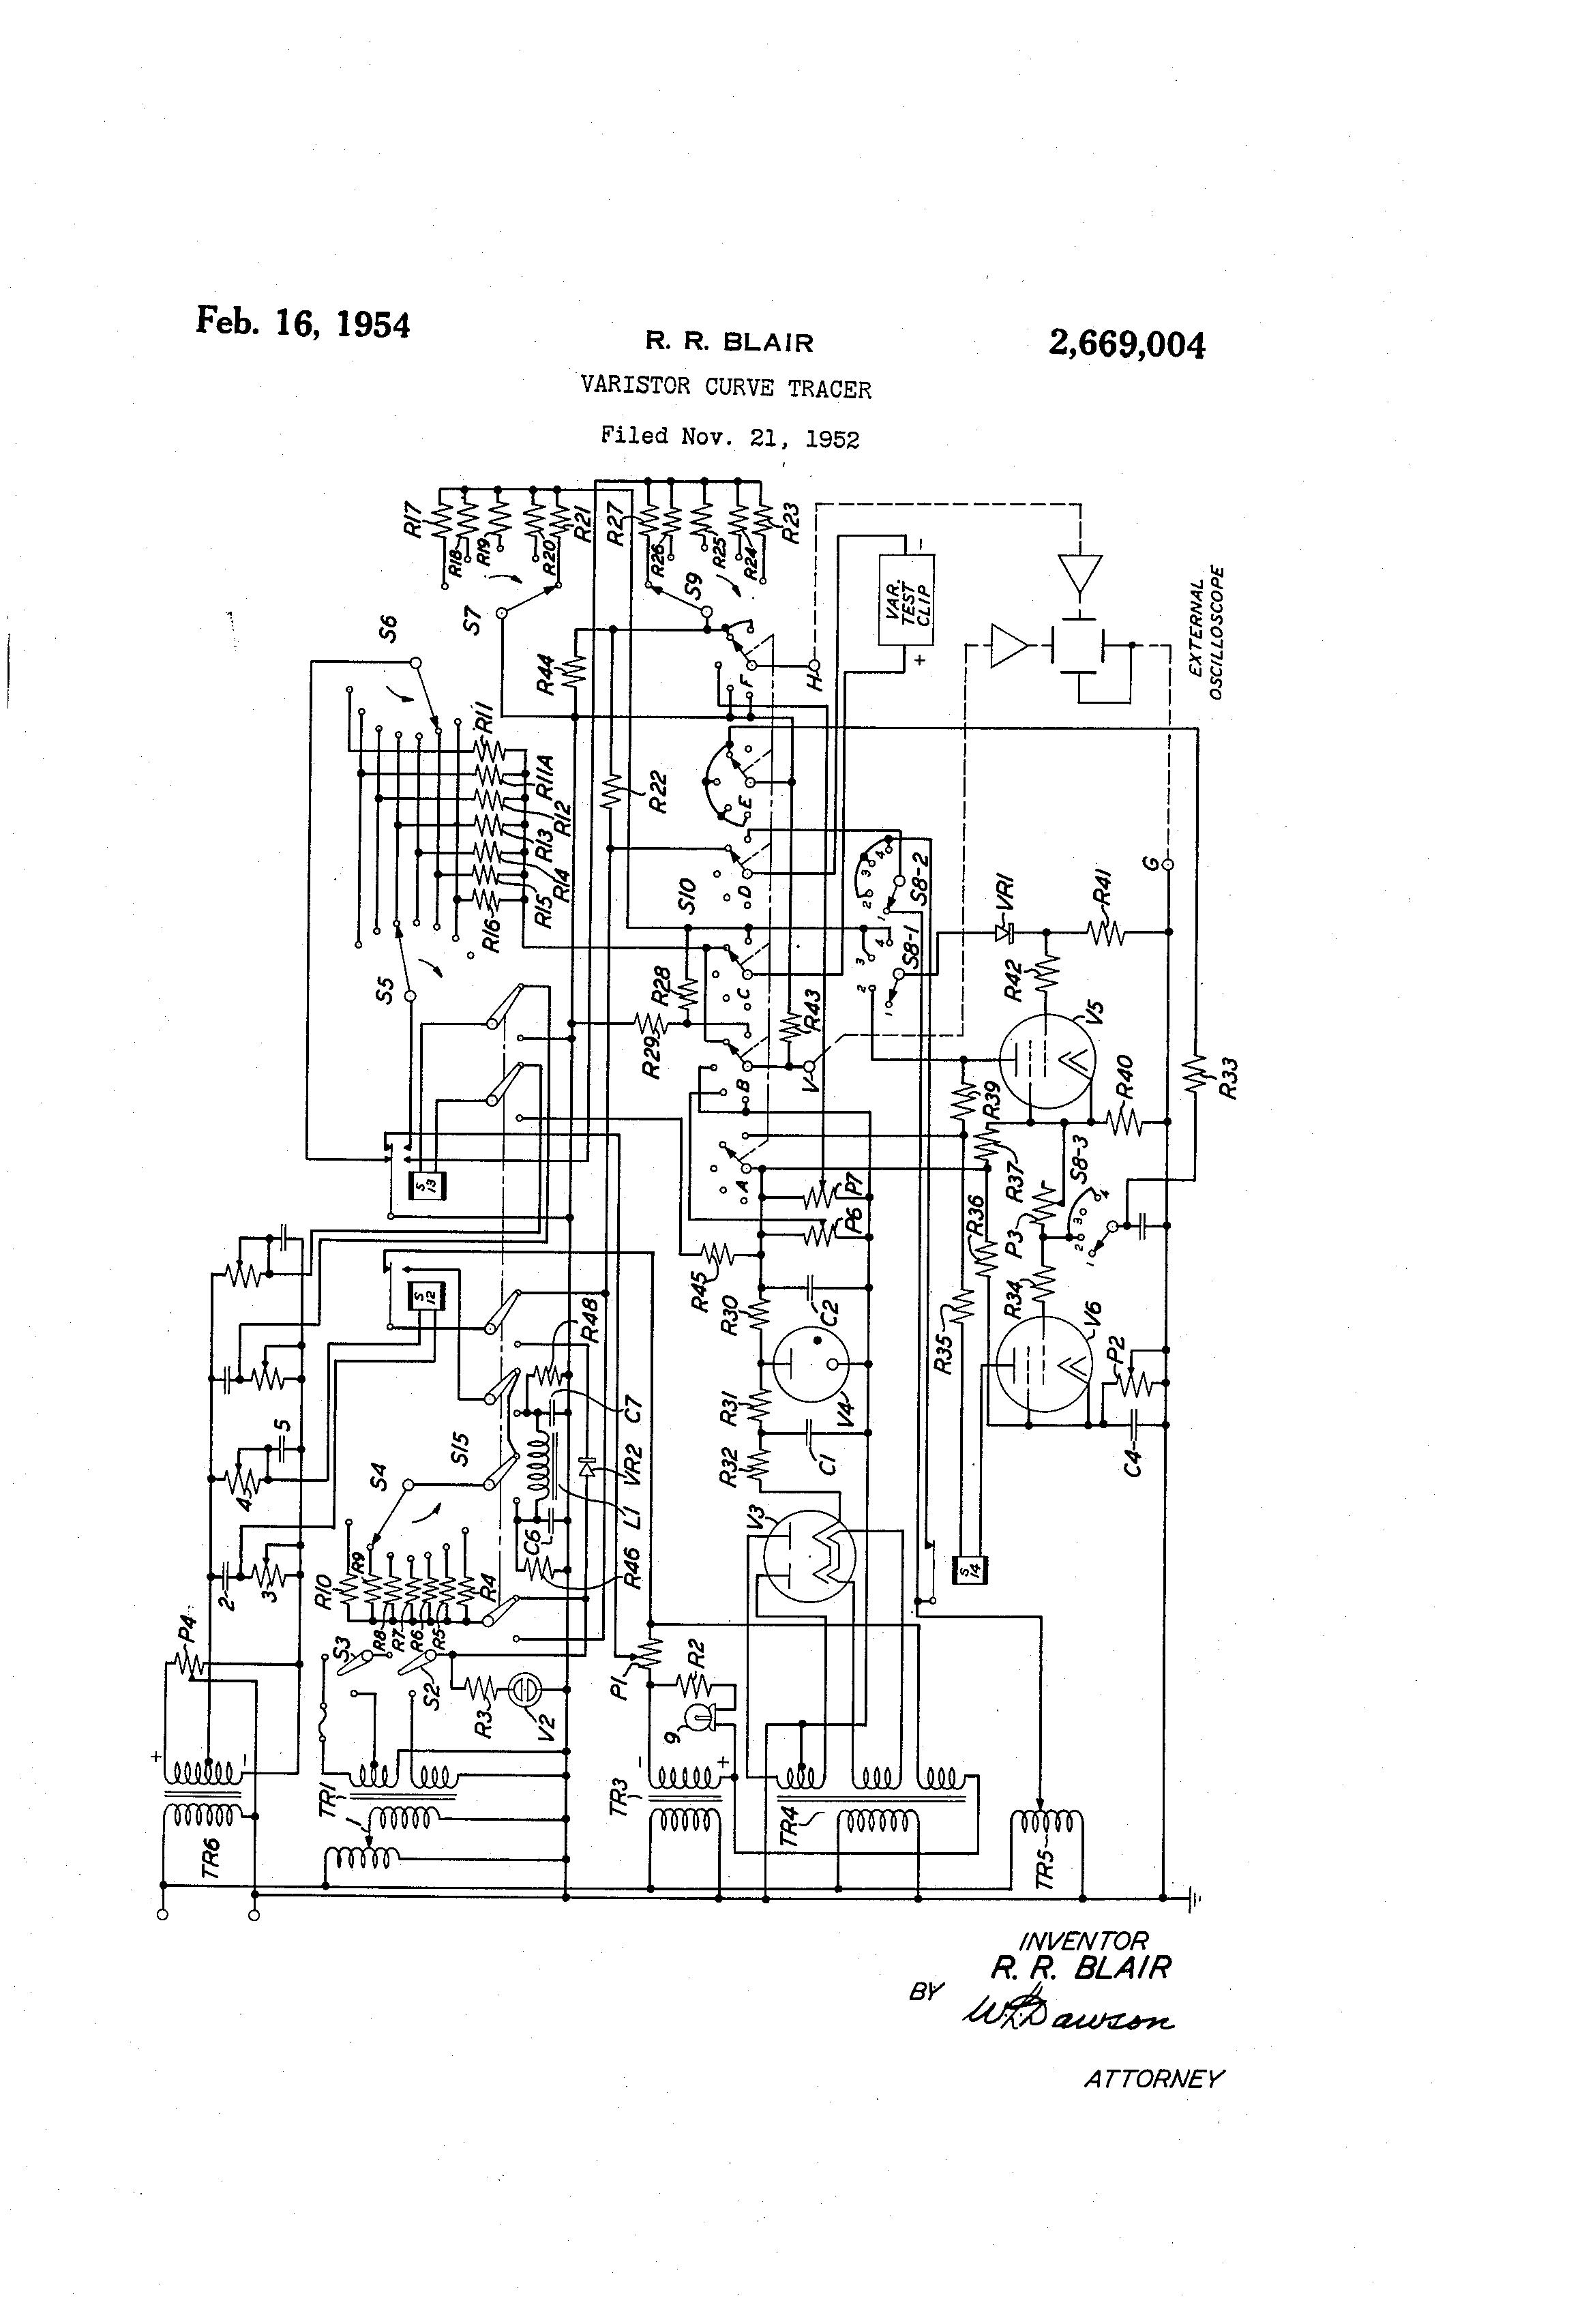 Brevet Us2669004 Varistor Curve Tracer Google Brevets Circuit Oscilloscope Patent Drawing